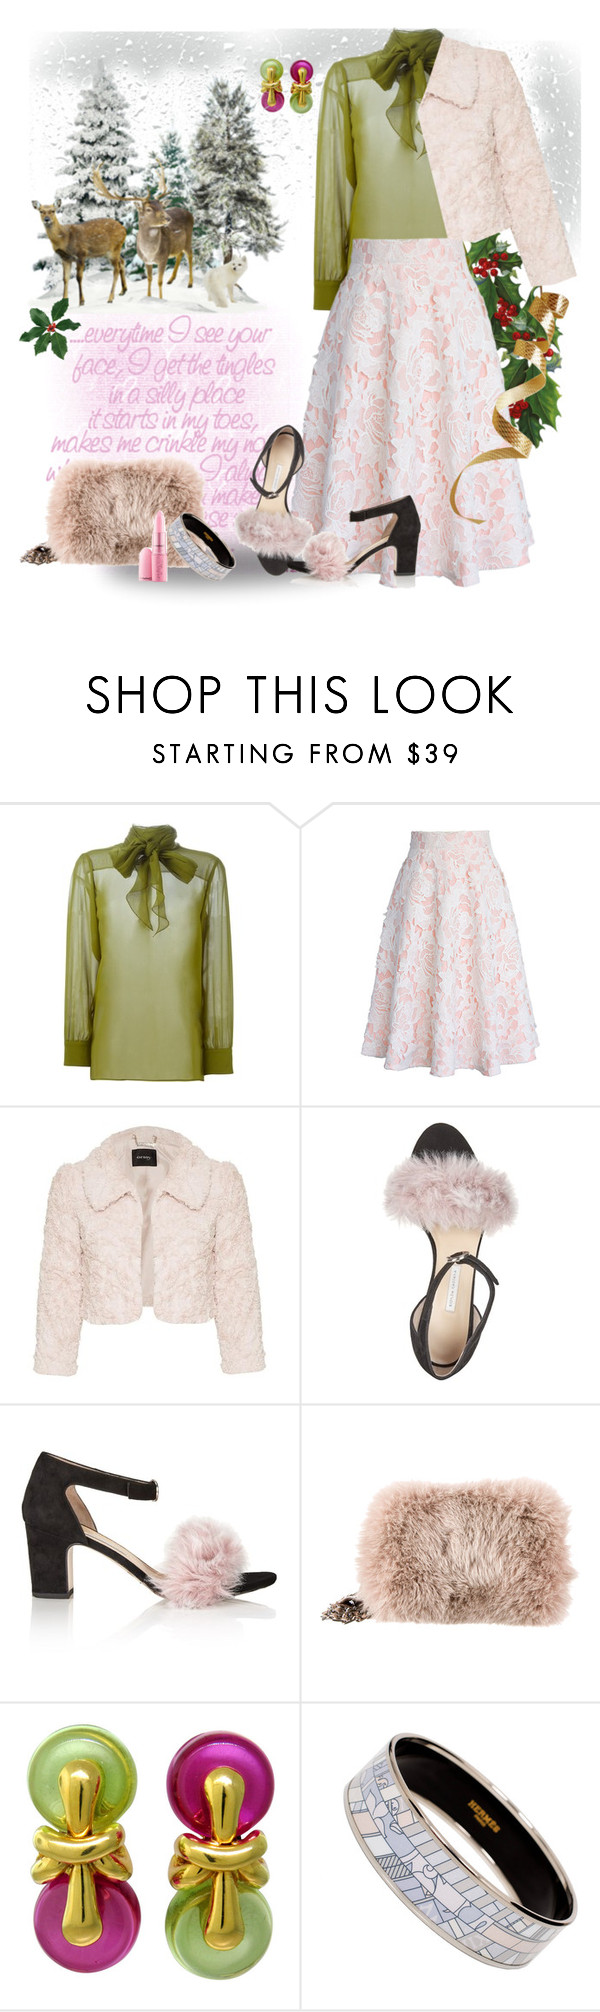 """holiday style"" by straylittle ❤ liked on Polyvore featuring Gucci, Chicwish, Bionda Castana, Prada, Marina B and Hermès"